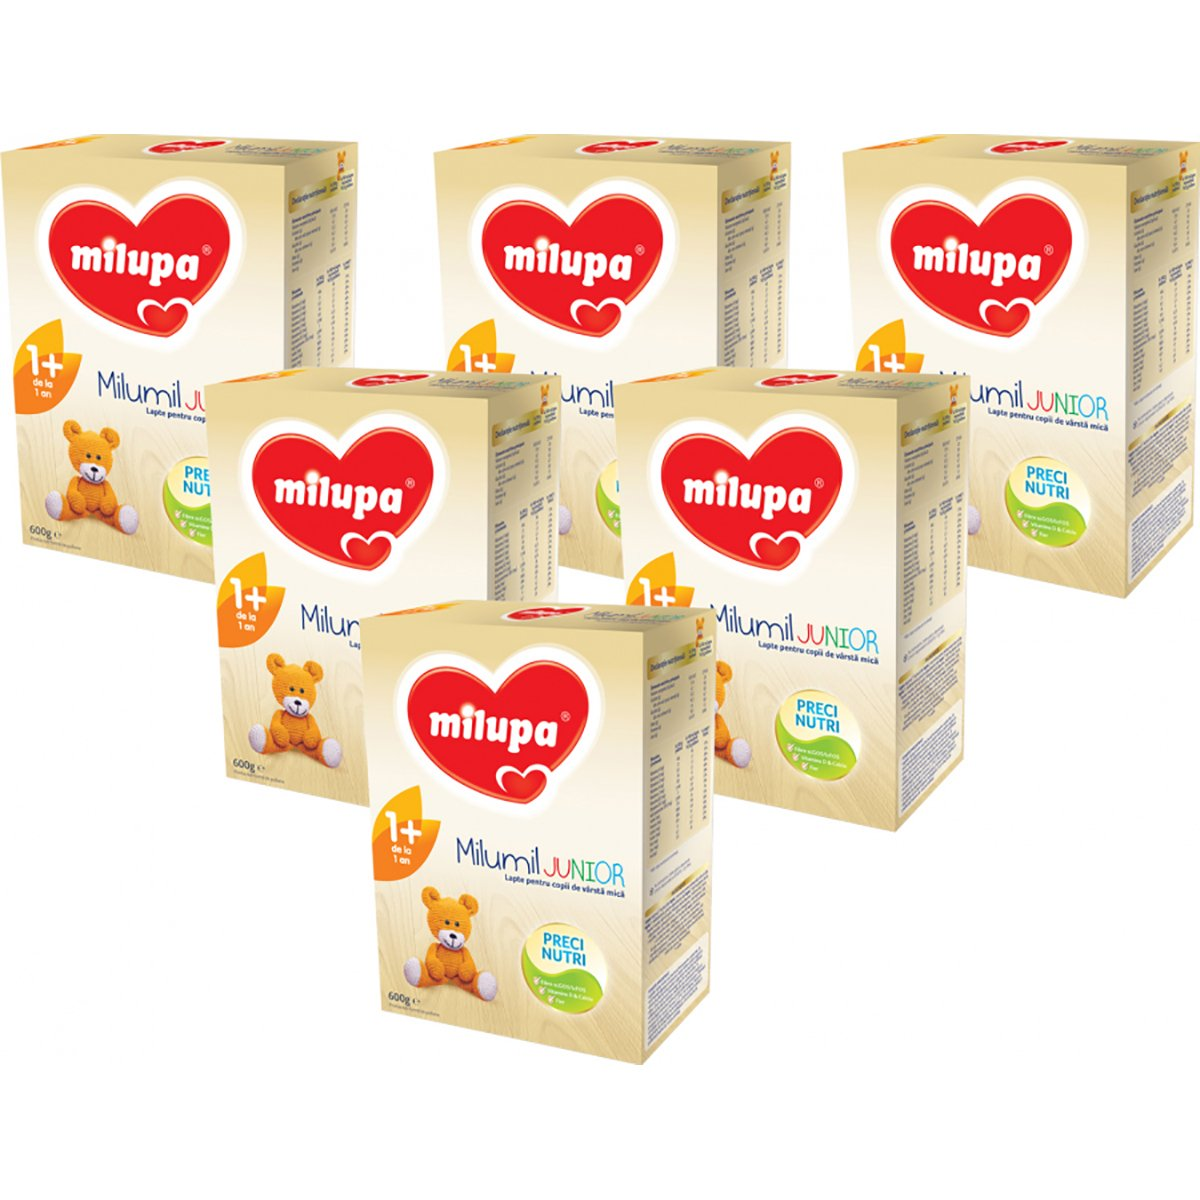 Lapte praf Milupa Milumil Junior 1+, 6 pachete x 600 g imagine